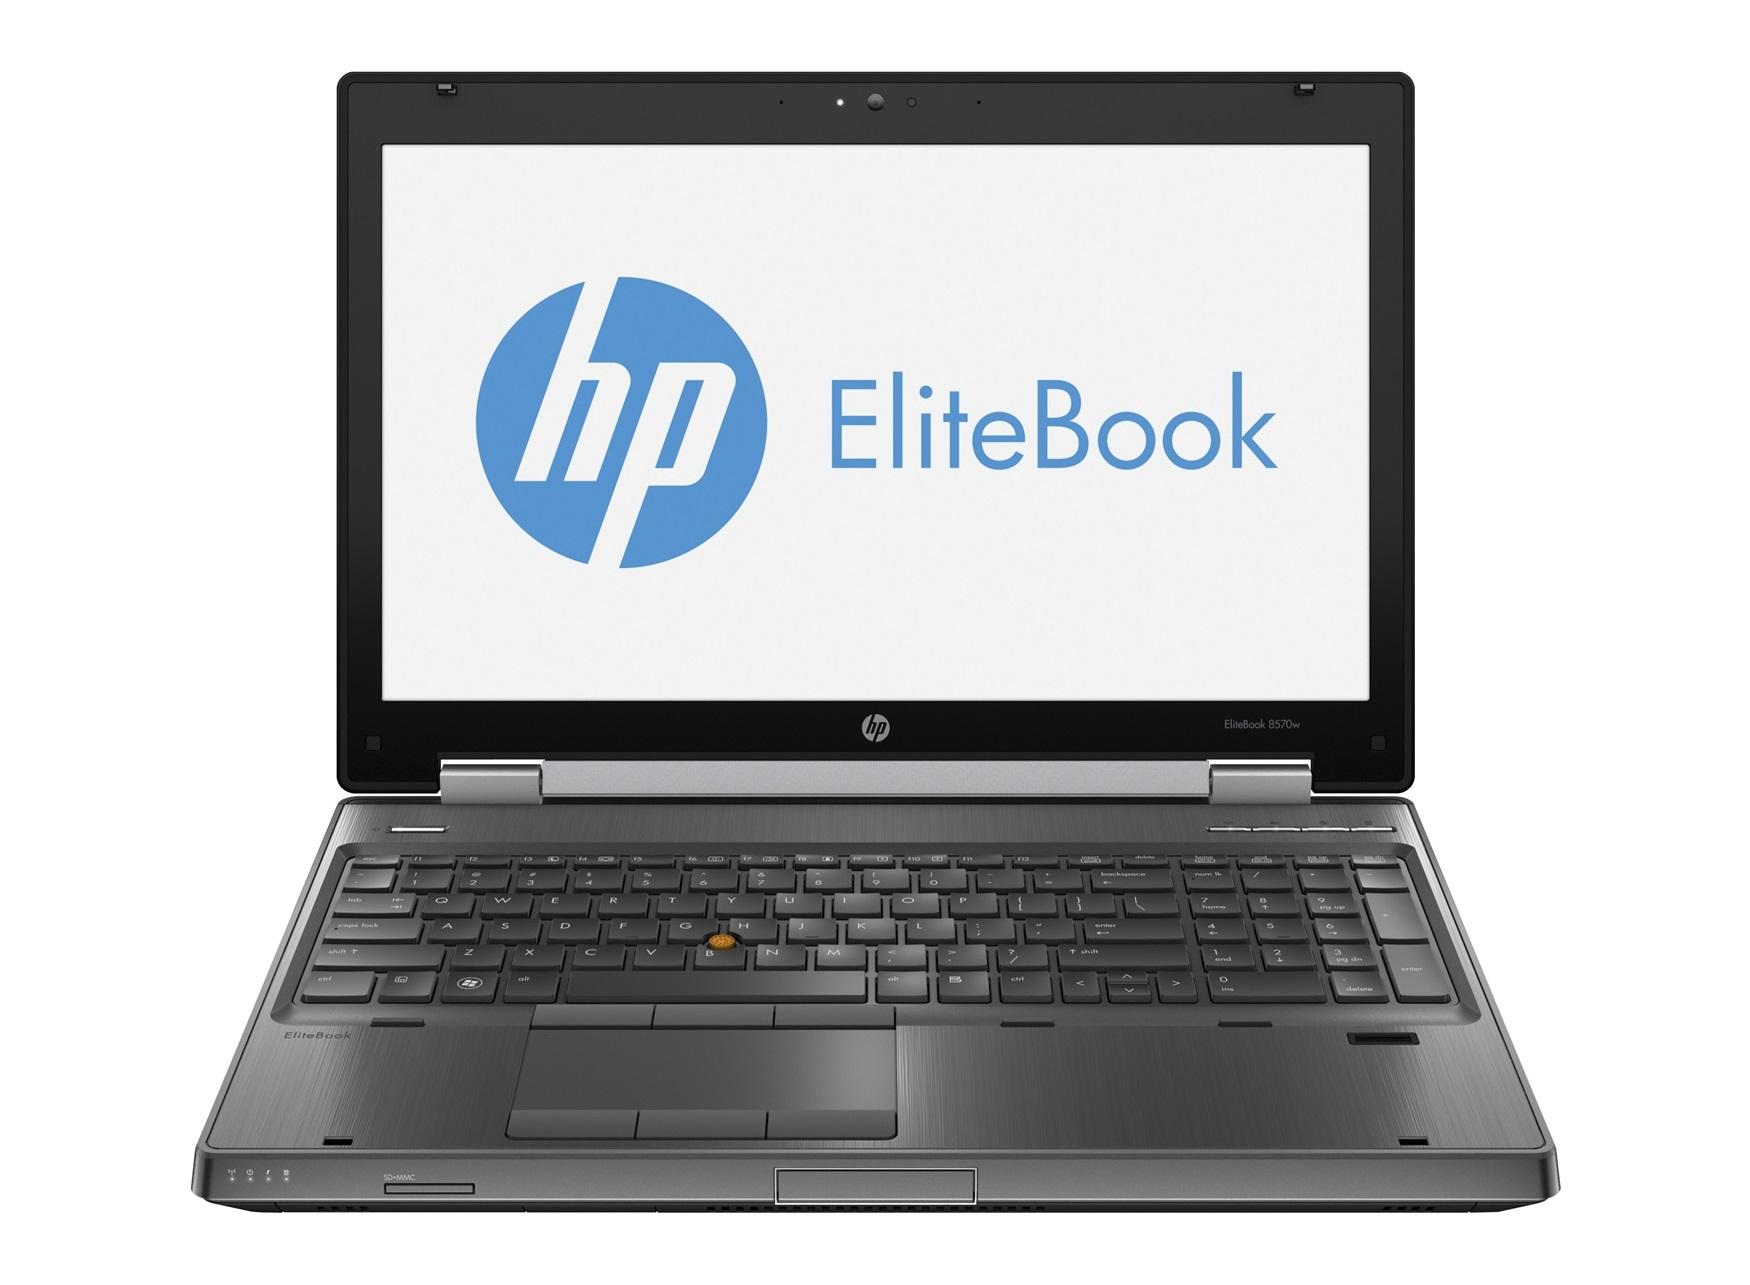 notebook hp elitebook 8570w 15 6 zoll intel core i7 128gb ssd 320gb festplatte 16gb speicher. Black Bedroom Furniture Sets. Home Design Ideas